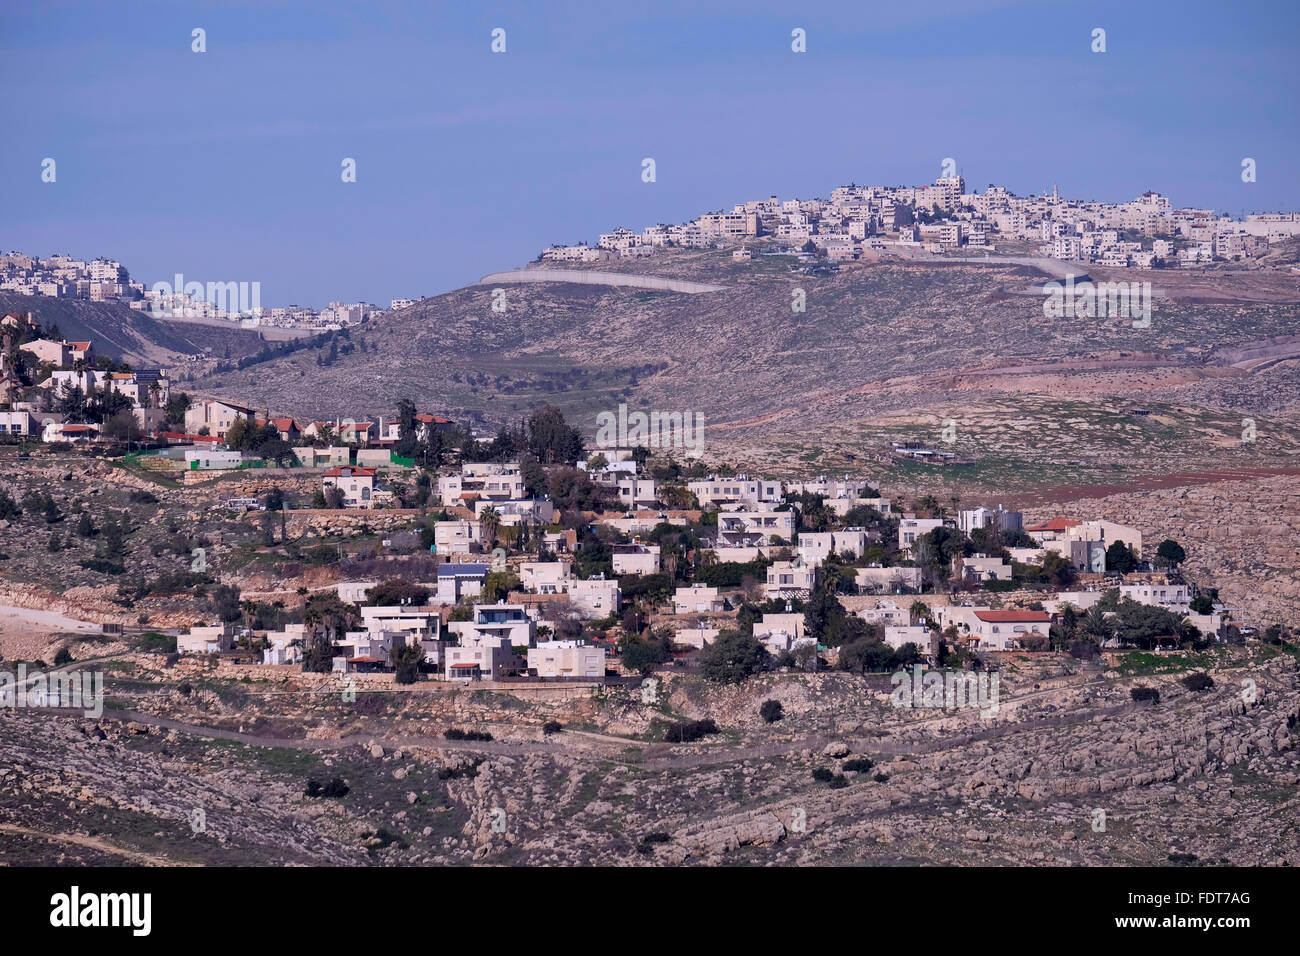 Almon israel